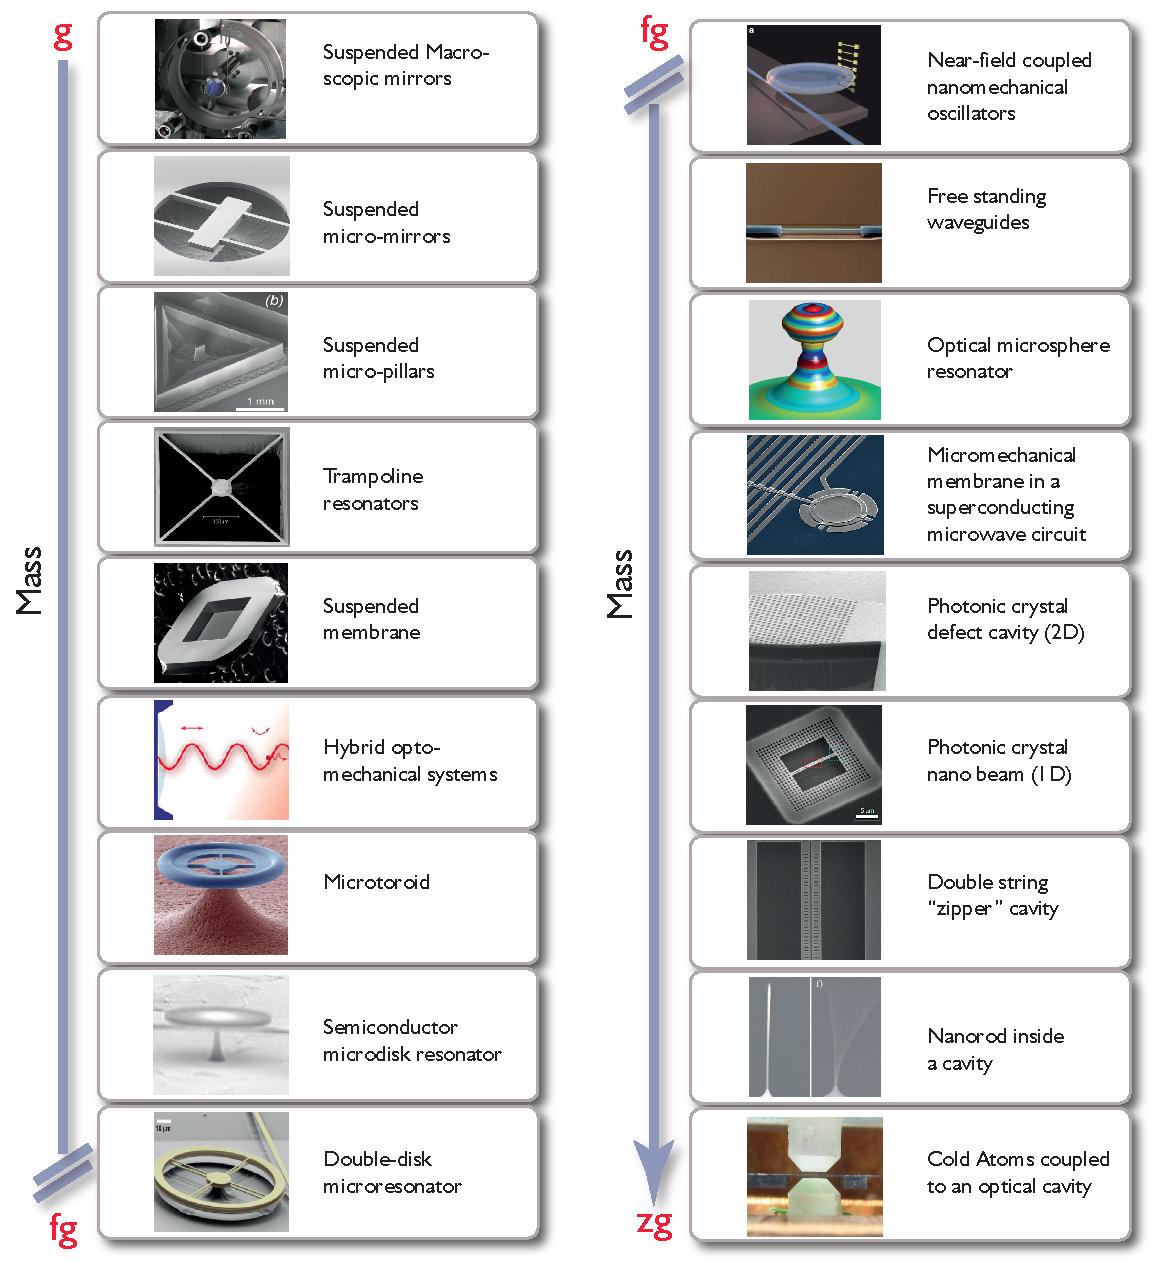 A gallery illustrating the variety of optomechanical devices, arranged according to mass. Pictures courtesy (from top left, down): N. Mavalvala, M. Aspelmeyer, A. Heidmann, D. Bouwmeester, J. Harris, P. Treutlein, T. J. Kippenberg, I. Favero, M. Lipson, T. J. Kippenberg/E. Weig/J. Kotthaus, H. Tang, K. Vahala/T. Carmon, J.Teufel/K.Lehnert, I. Robert, O. Painter, O. Painter, I.Favero/E.Weig/K.Karrai, D. Stamper-Kurn